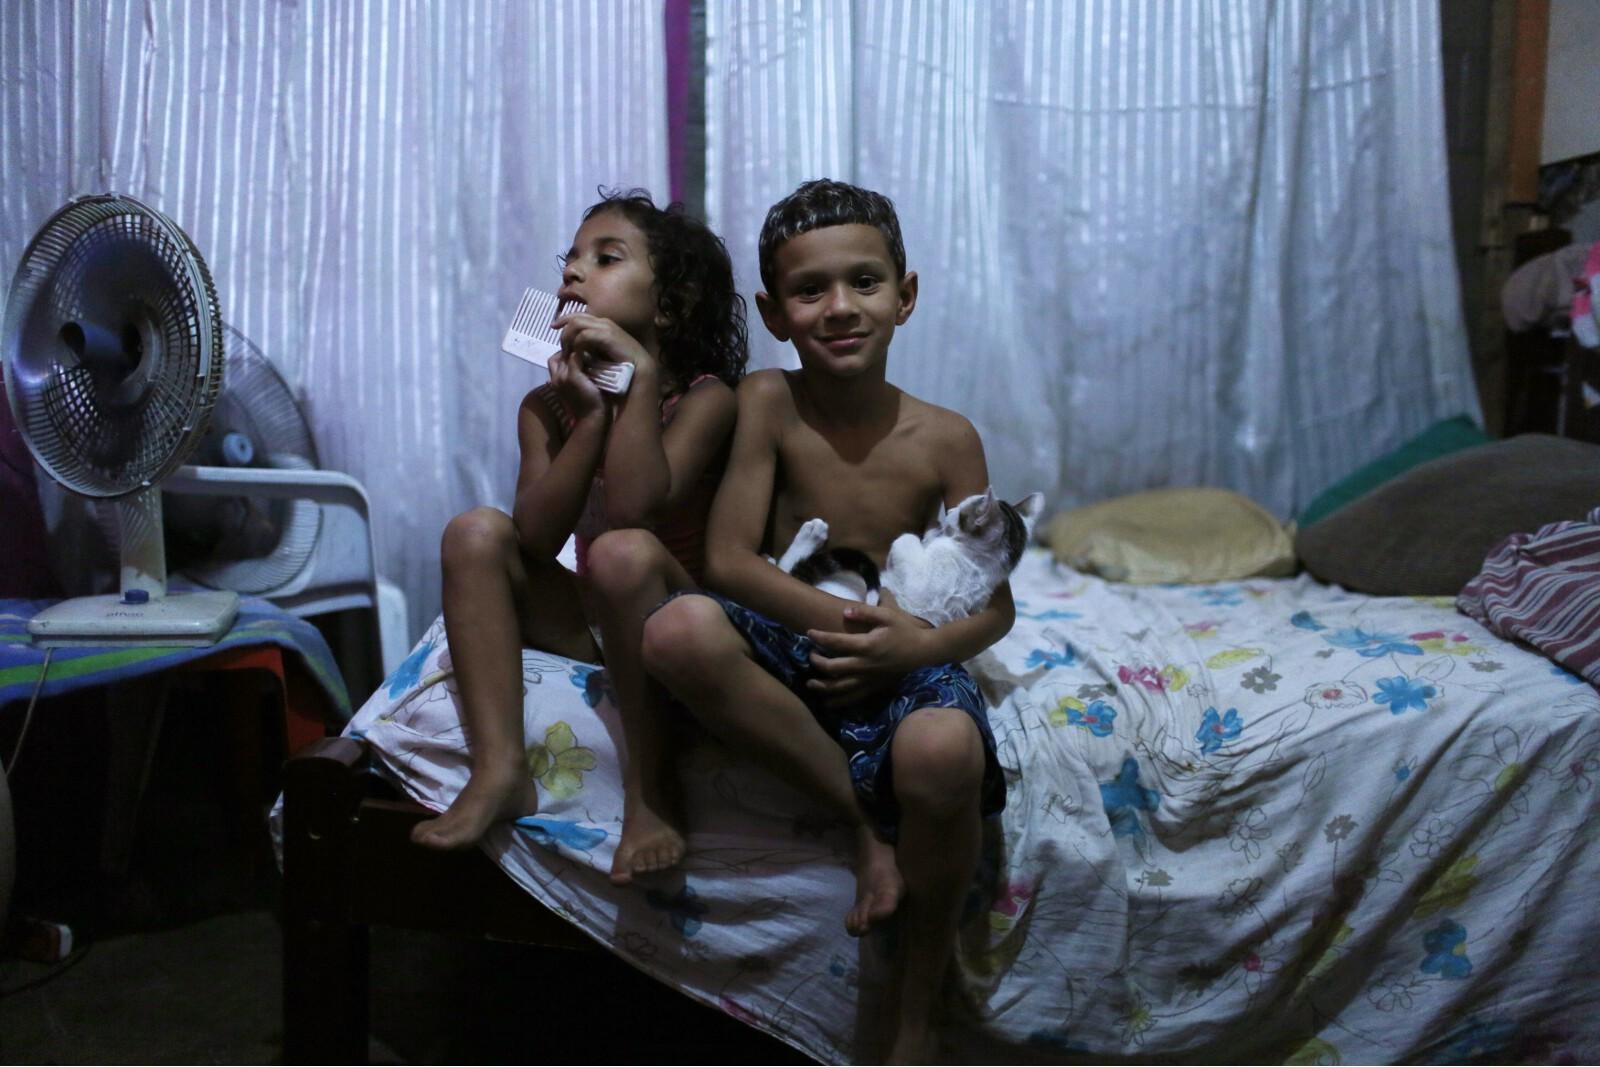 Brazil Factory Slum Boy and Girl